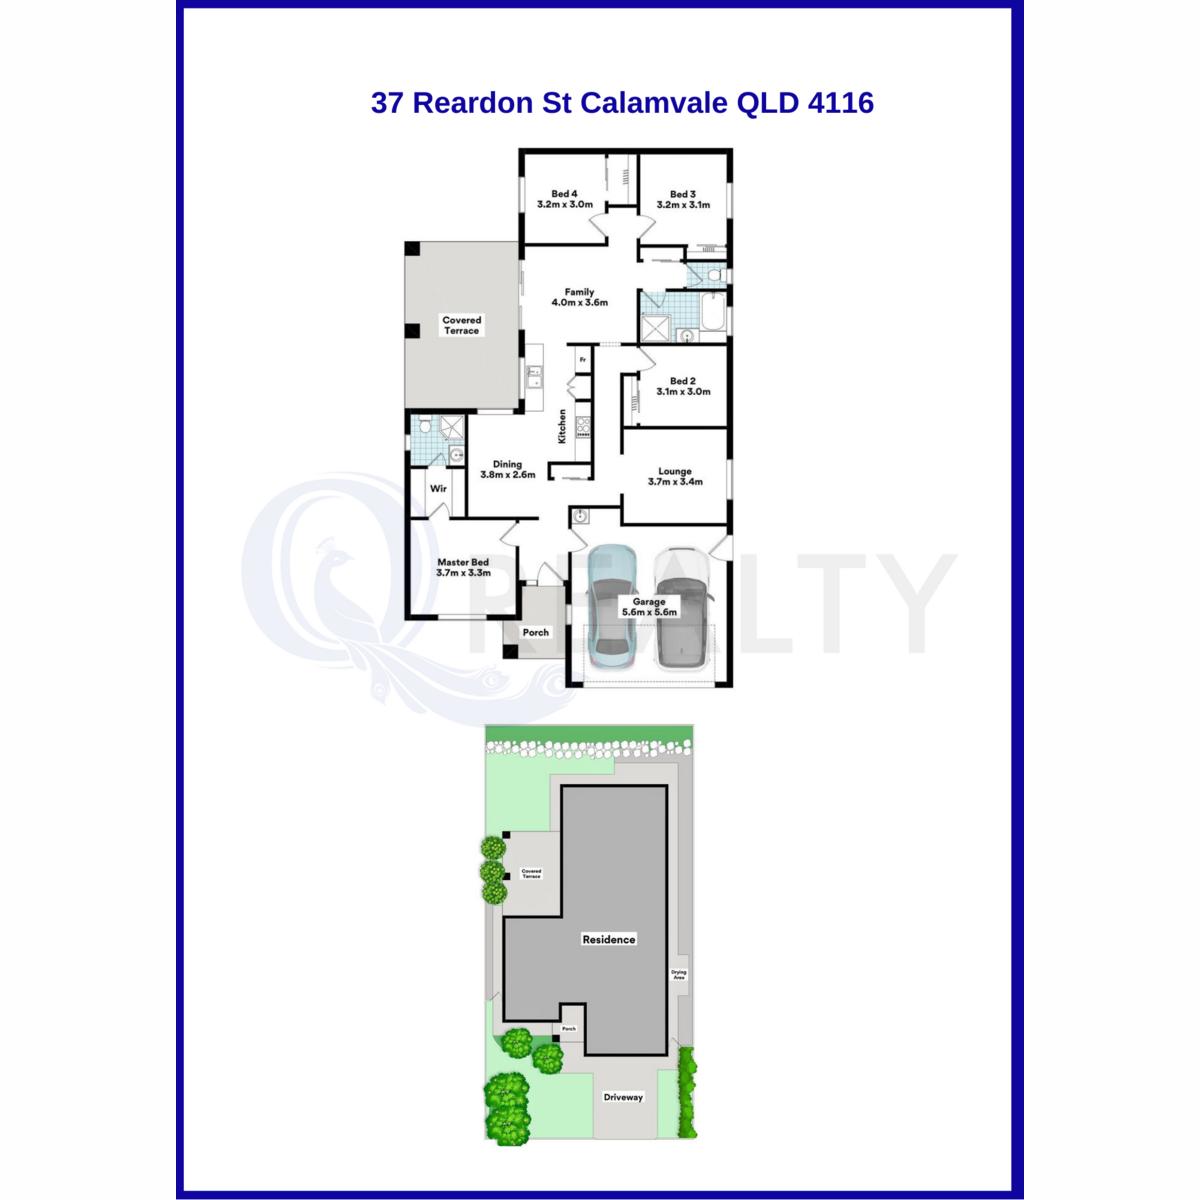 37 Reardon Street, Calamvale  QLD  4116